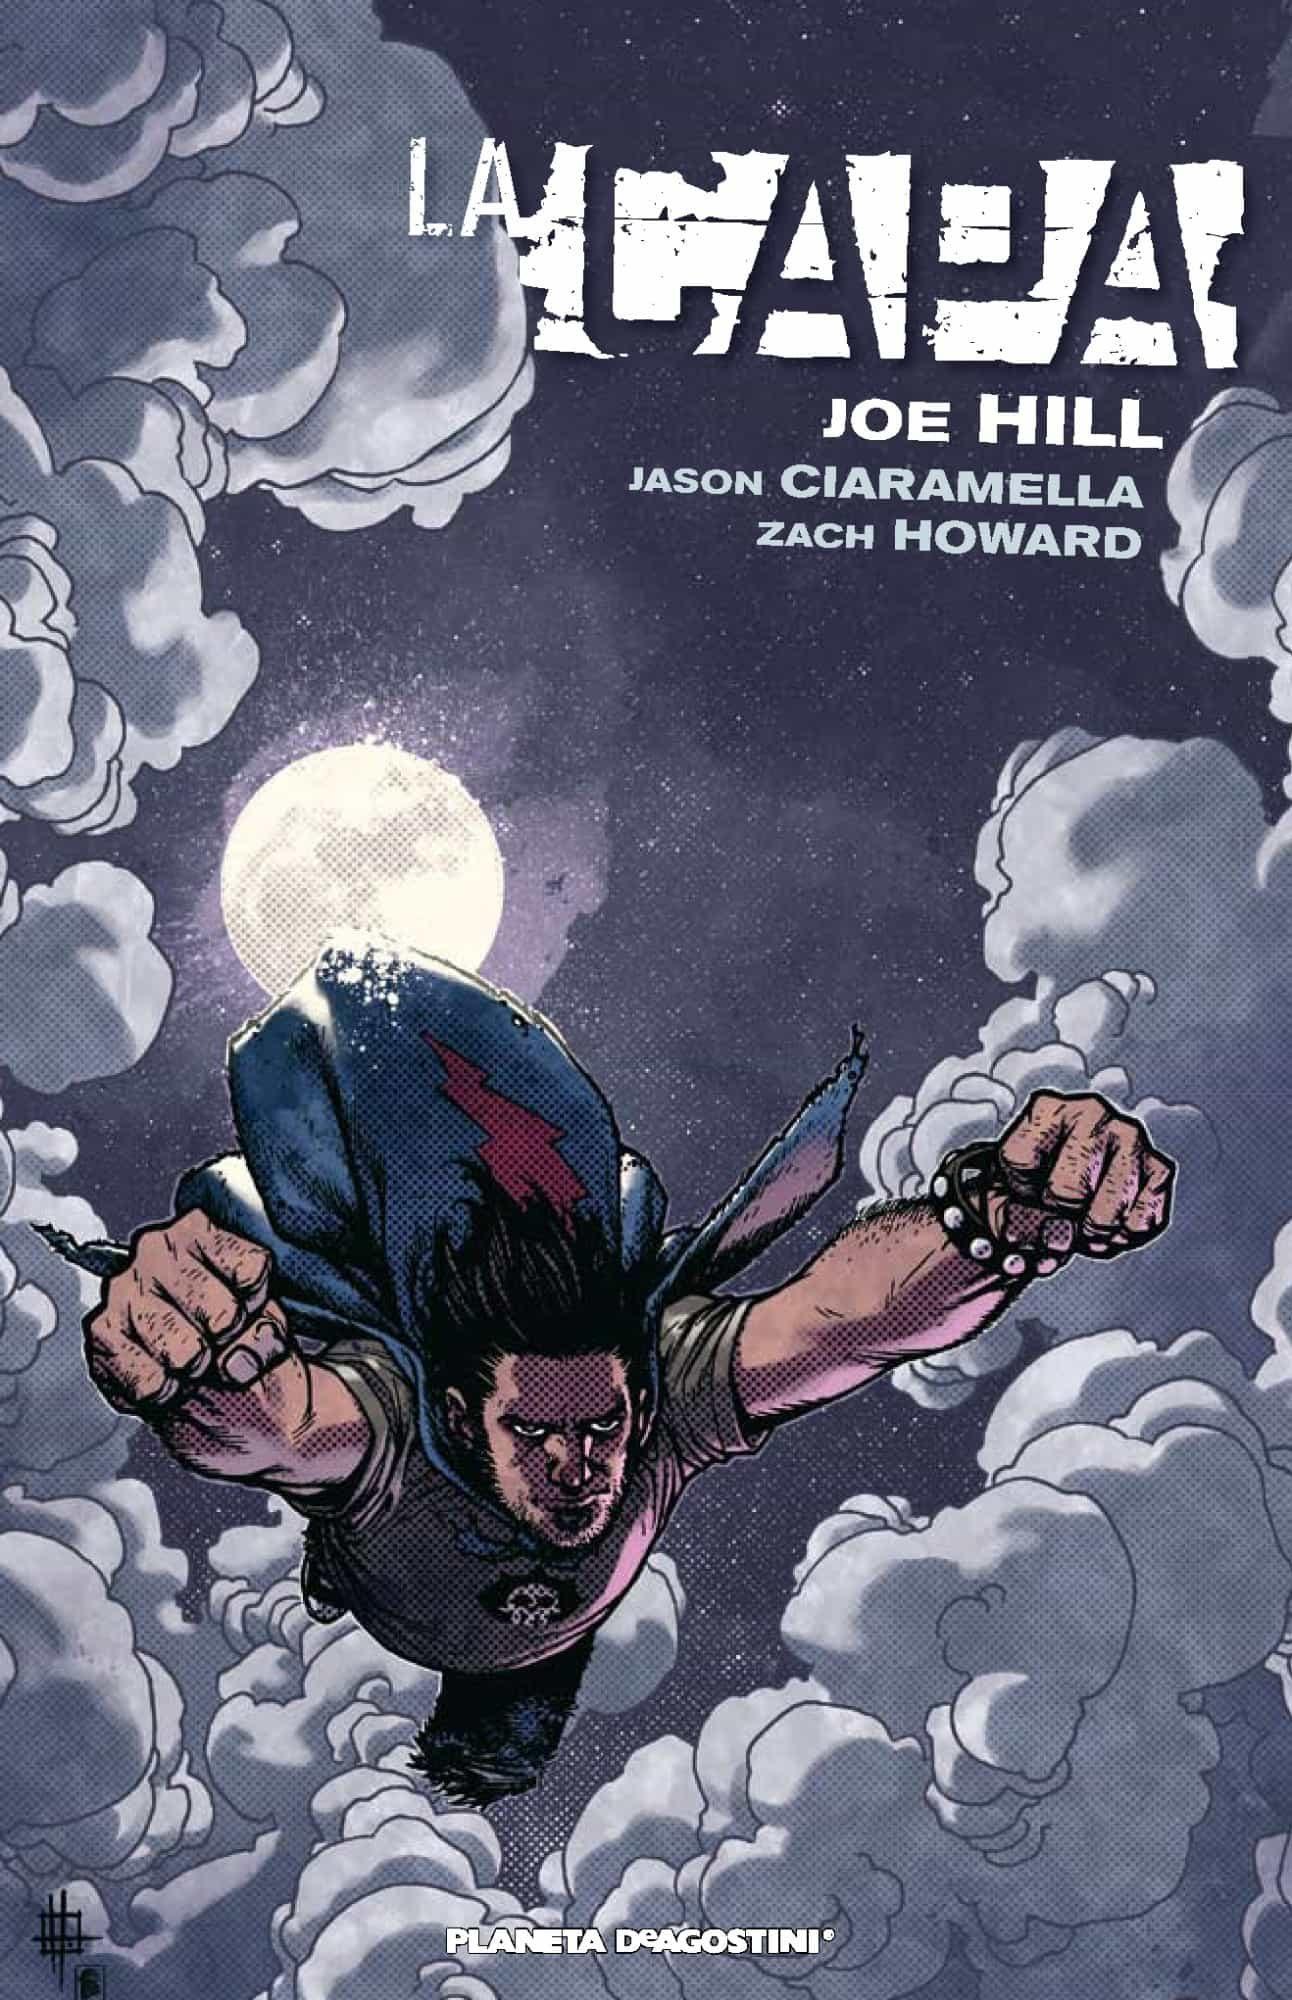 LA CAPA | JOE HILL | Comprar libro 9788415480013